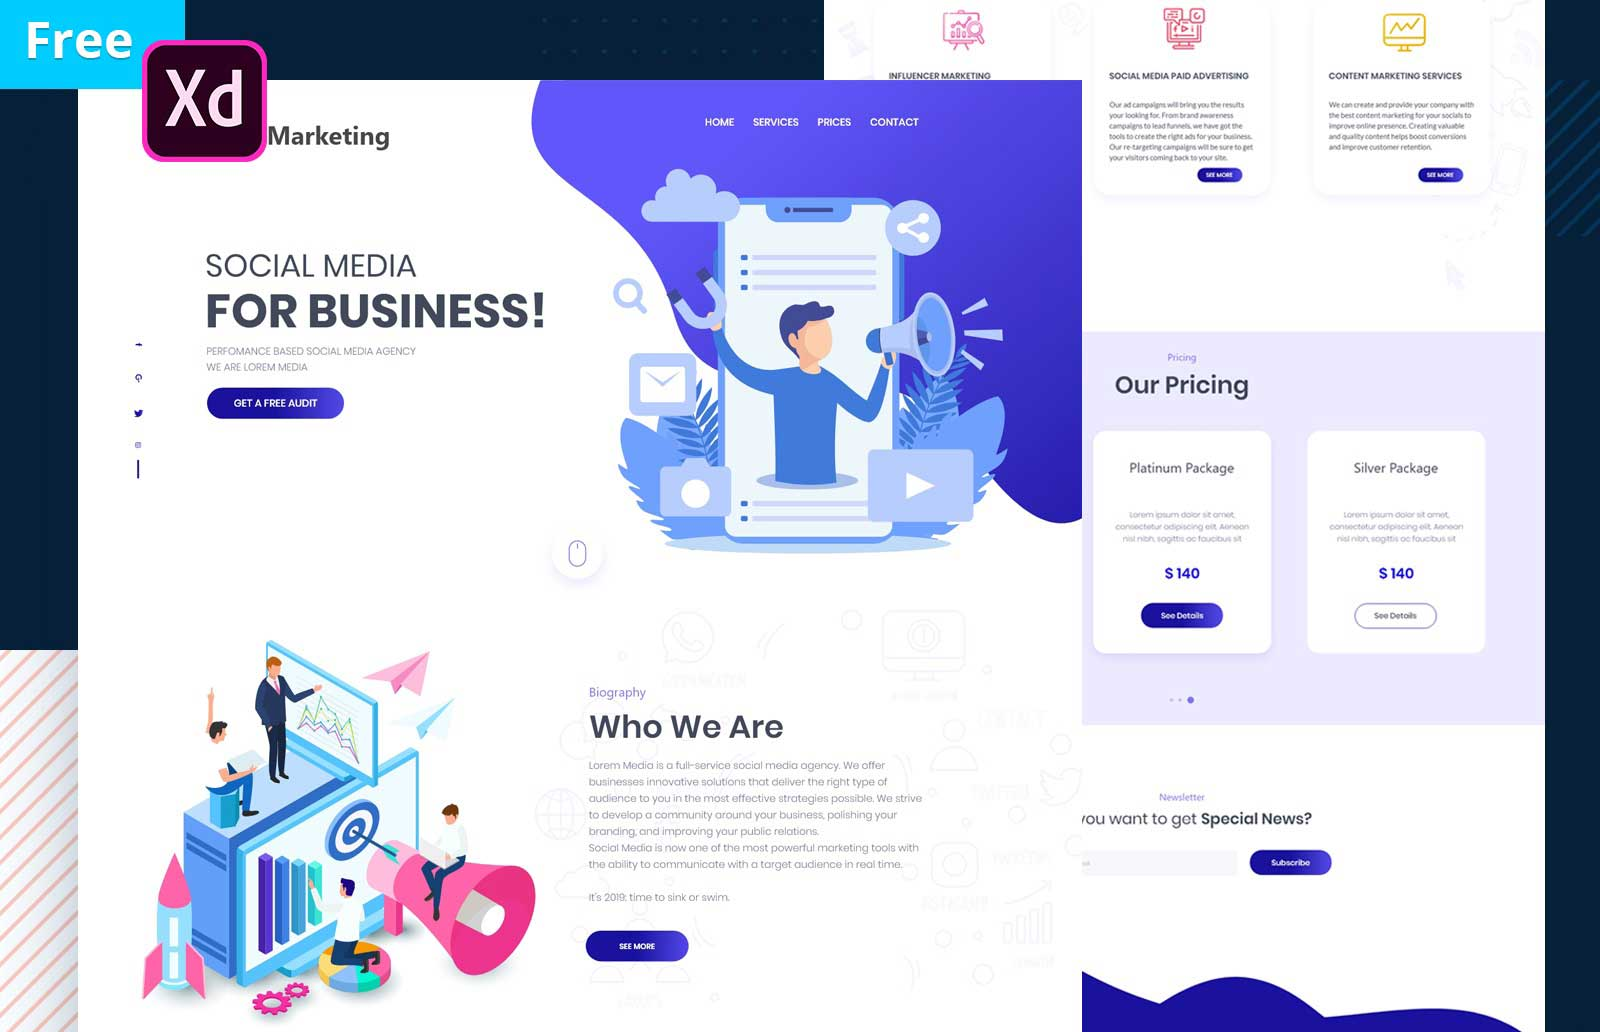 Free Social Media Marketing Xd Website Template Free Adobe Xd File